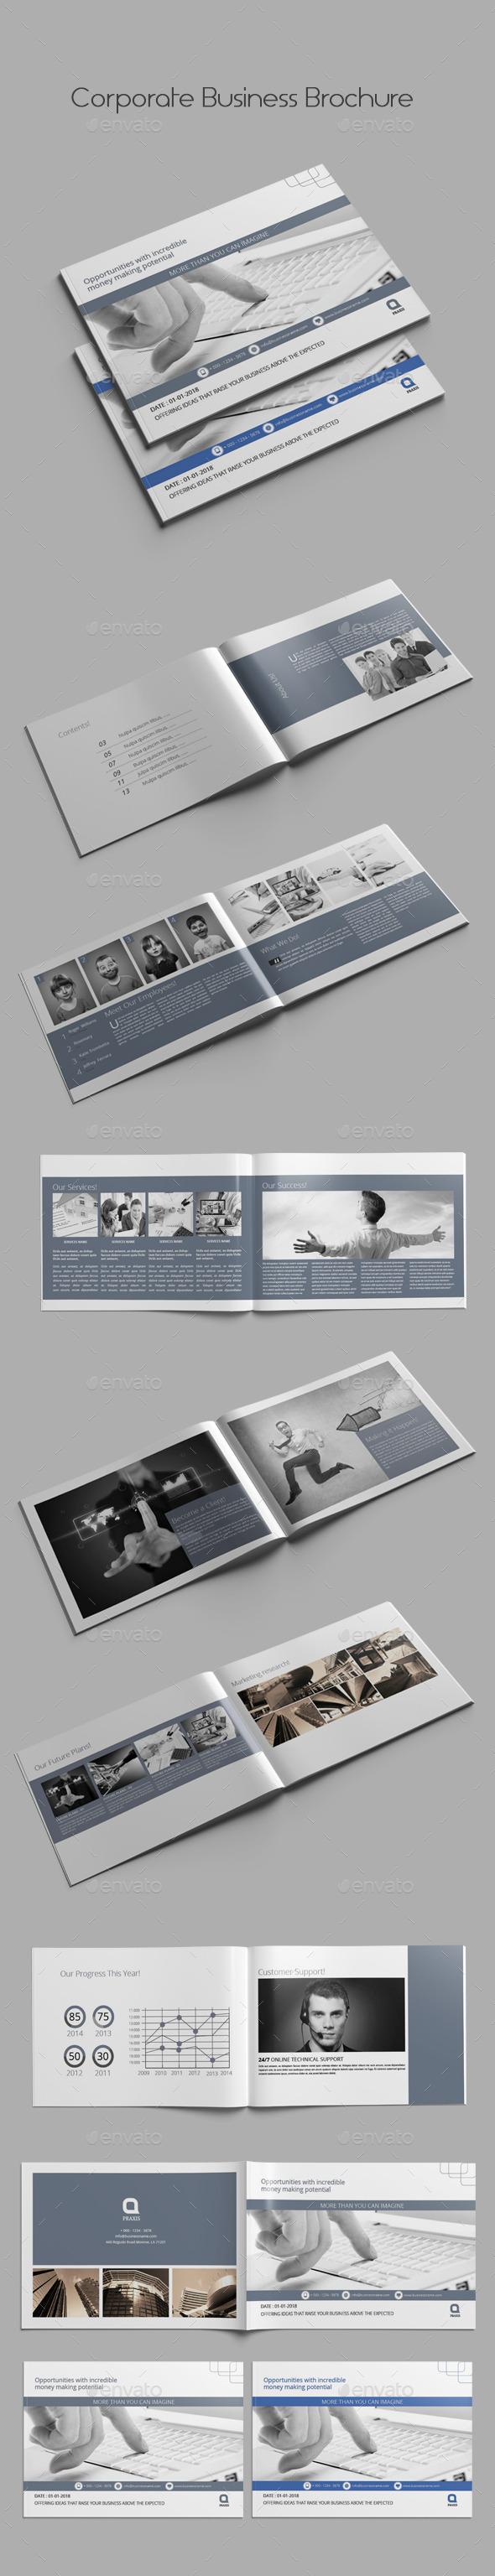 GraphicRiver Corporate Business Brochure 9858379